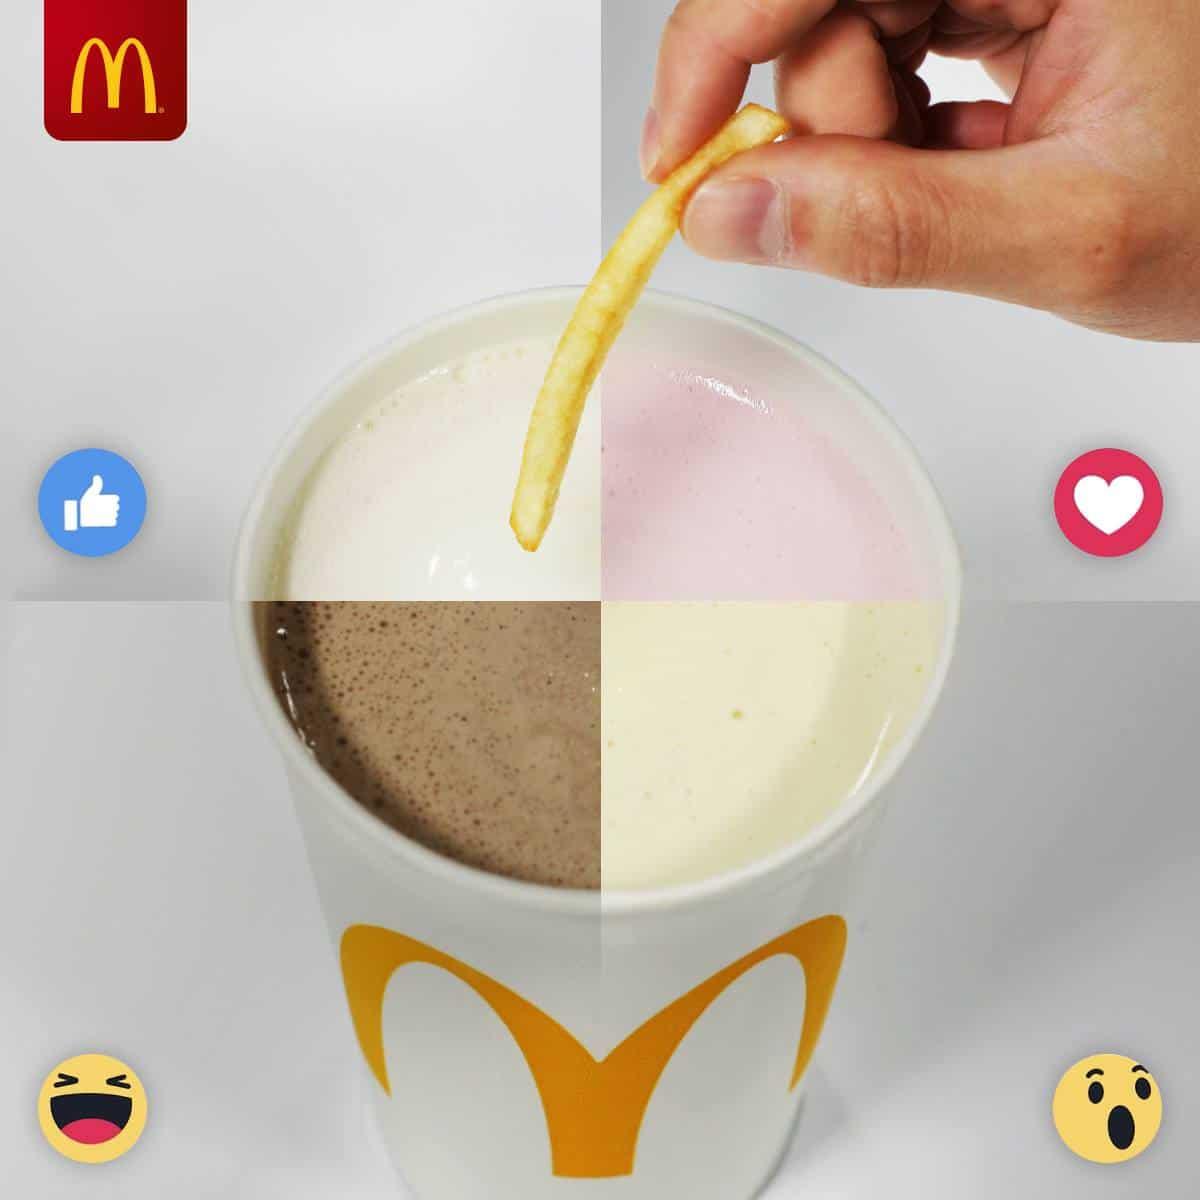 McDonald's fries and milkshake | Photo: McDonalds / Facebook